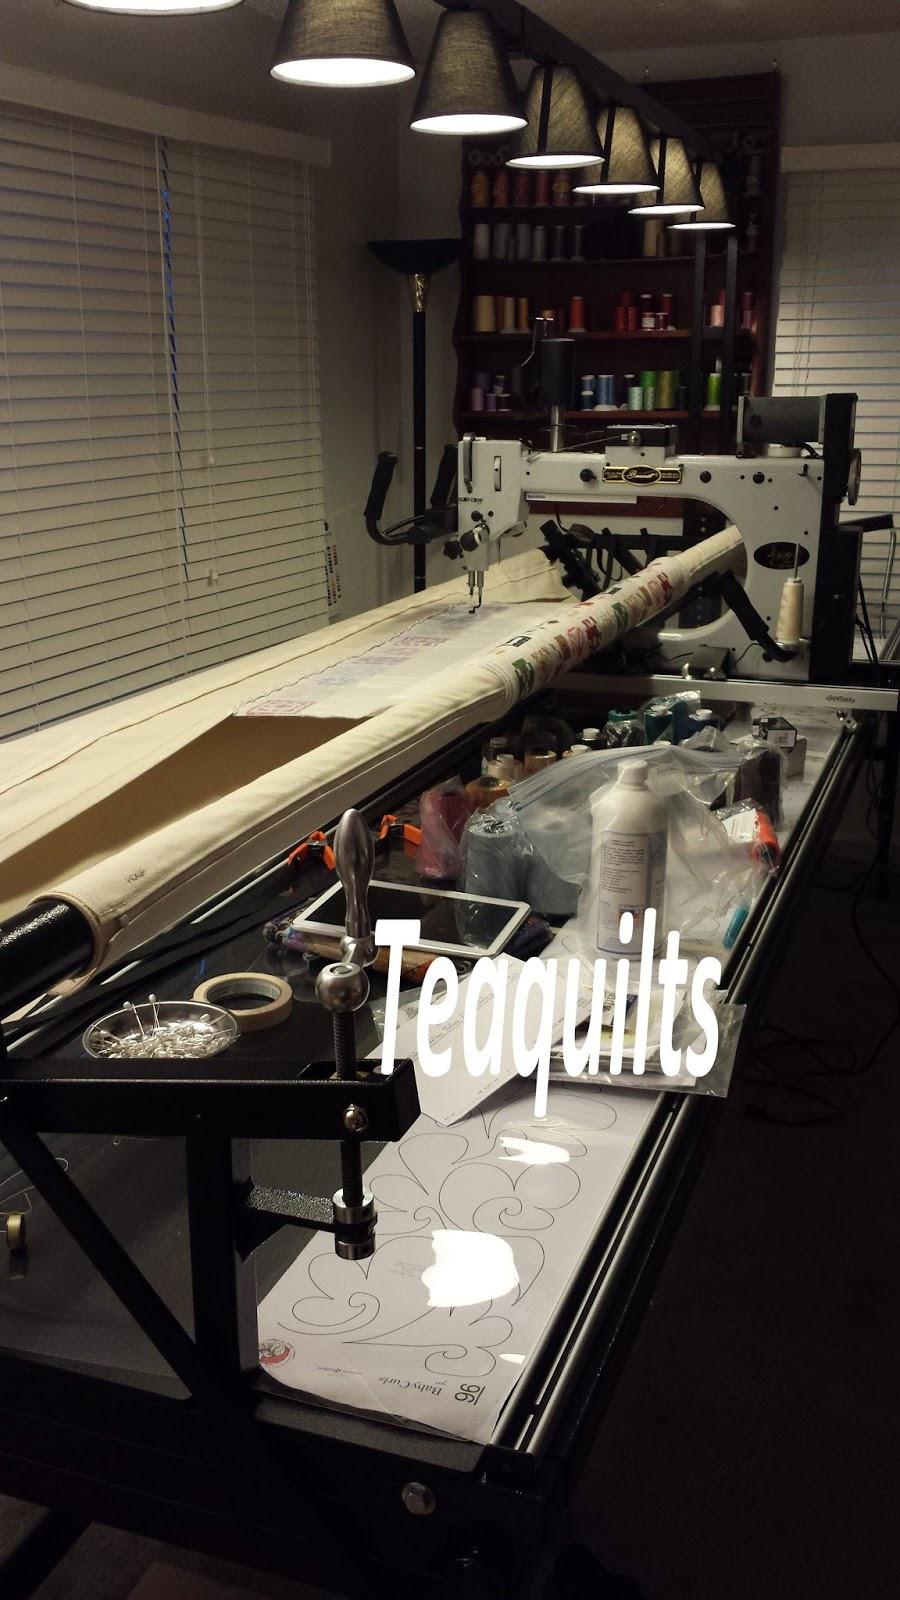 Teaquilts Long Arm Quilting Machine